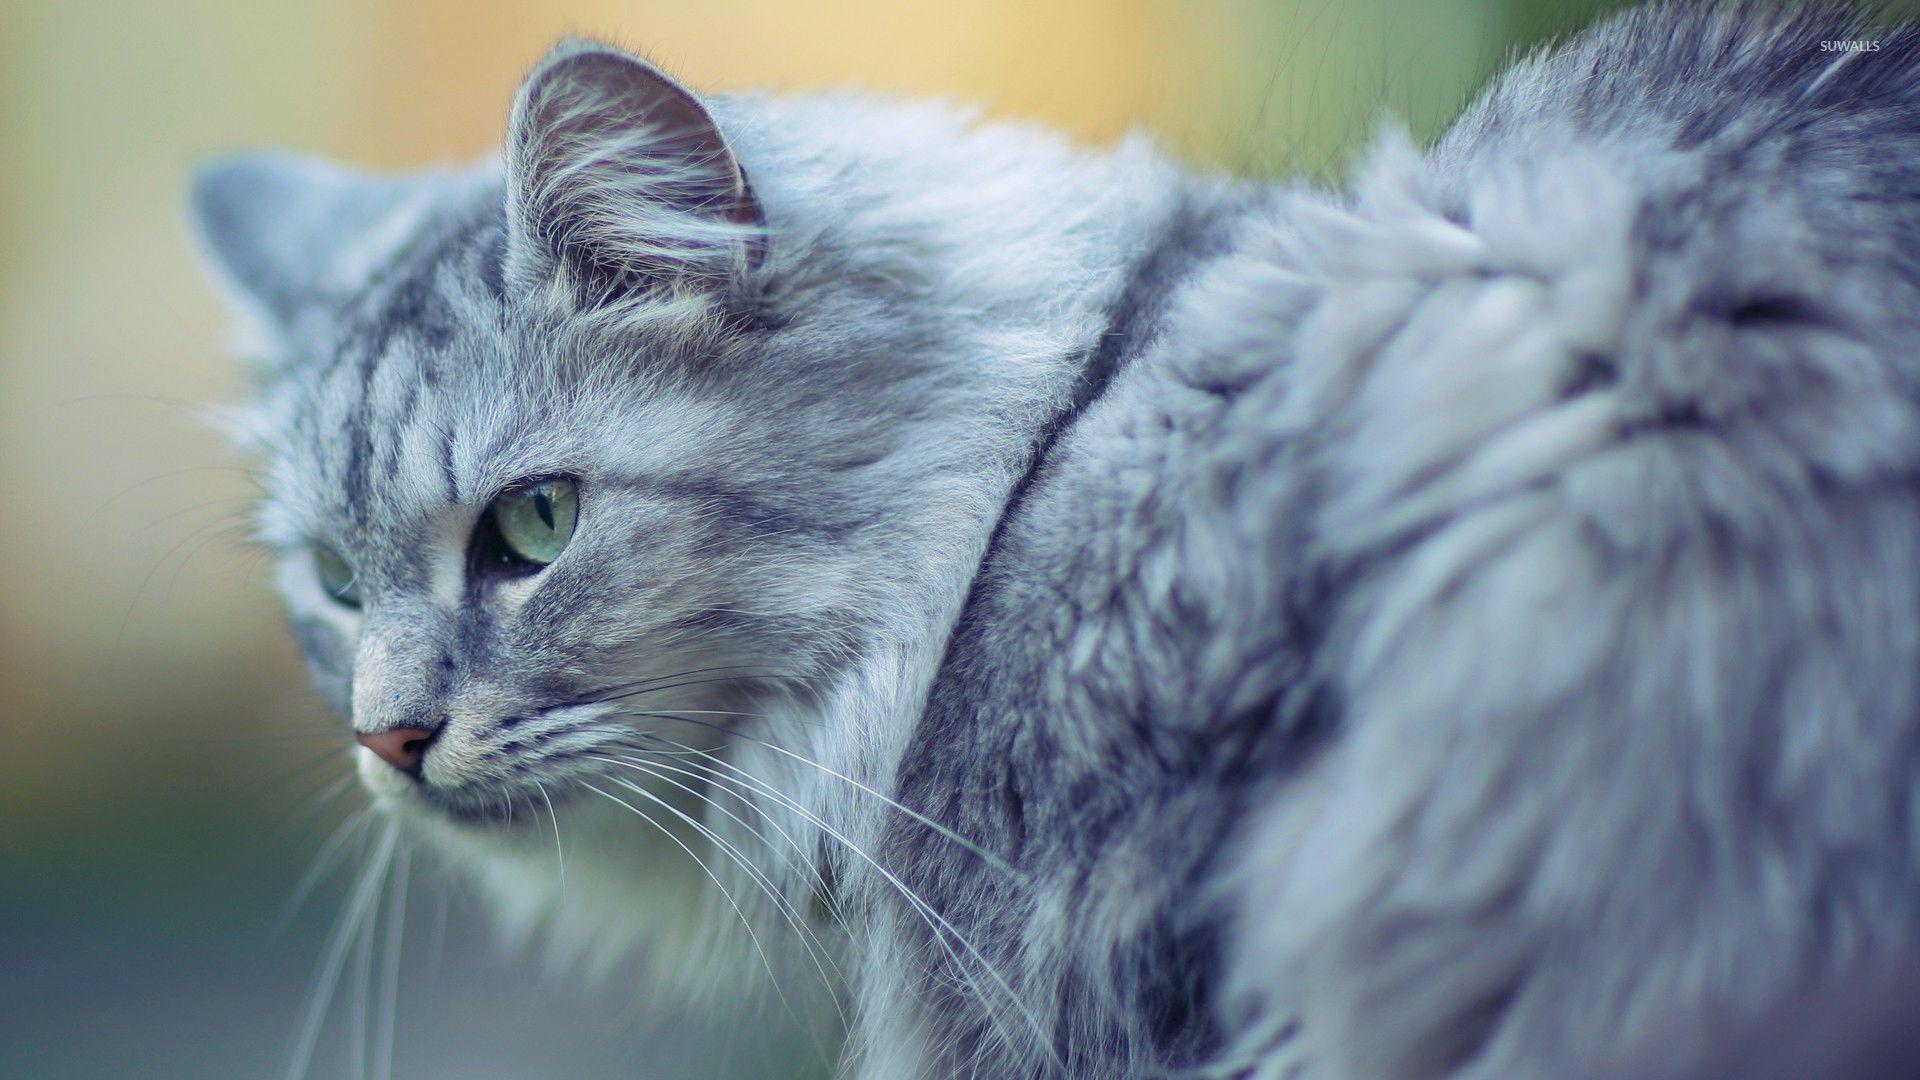 gray-cat-33401-1920x1080.jpg